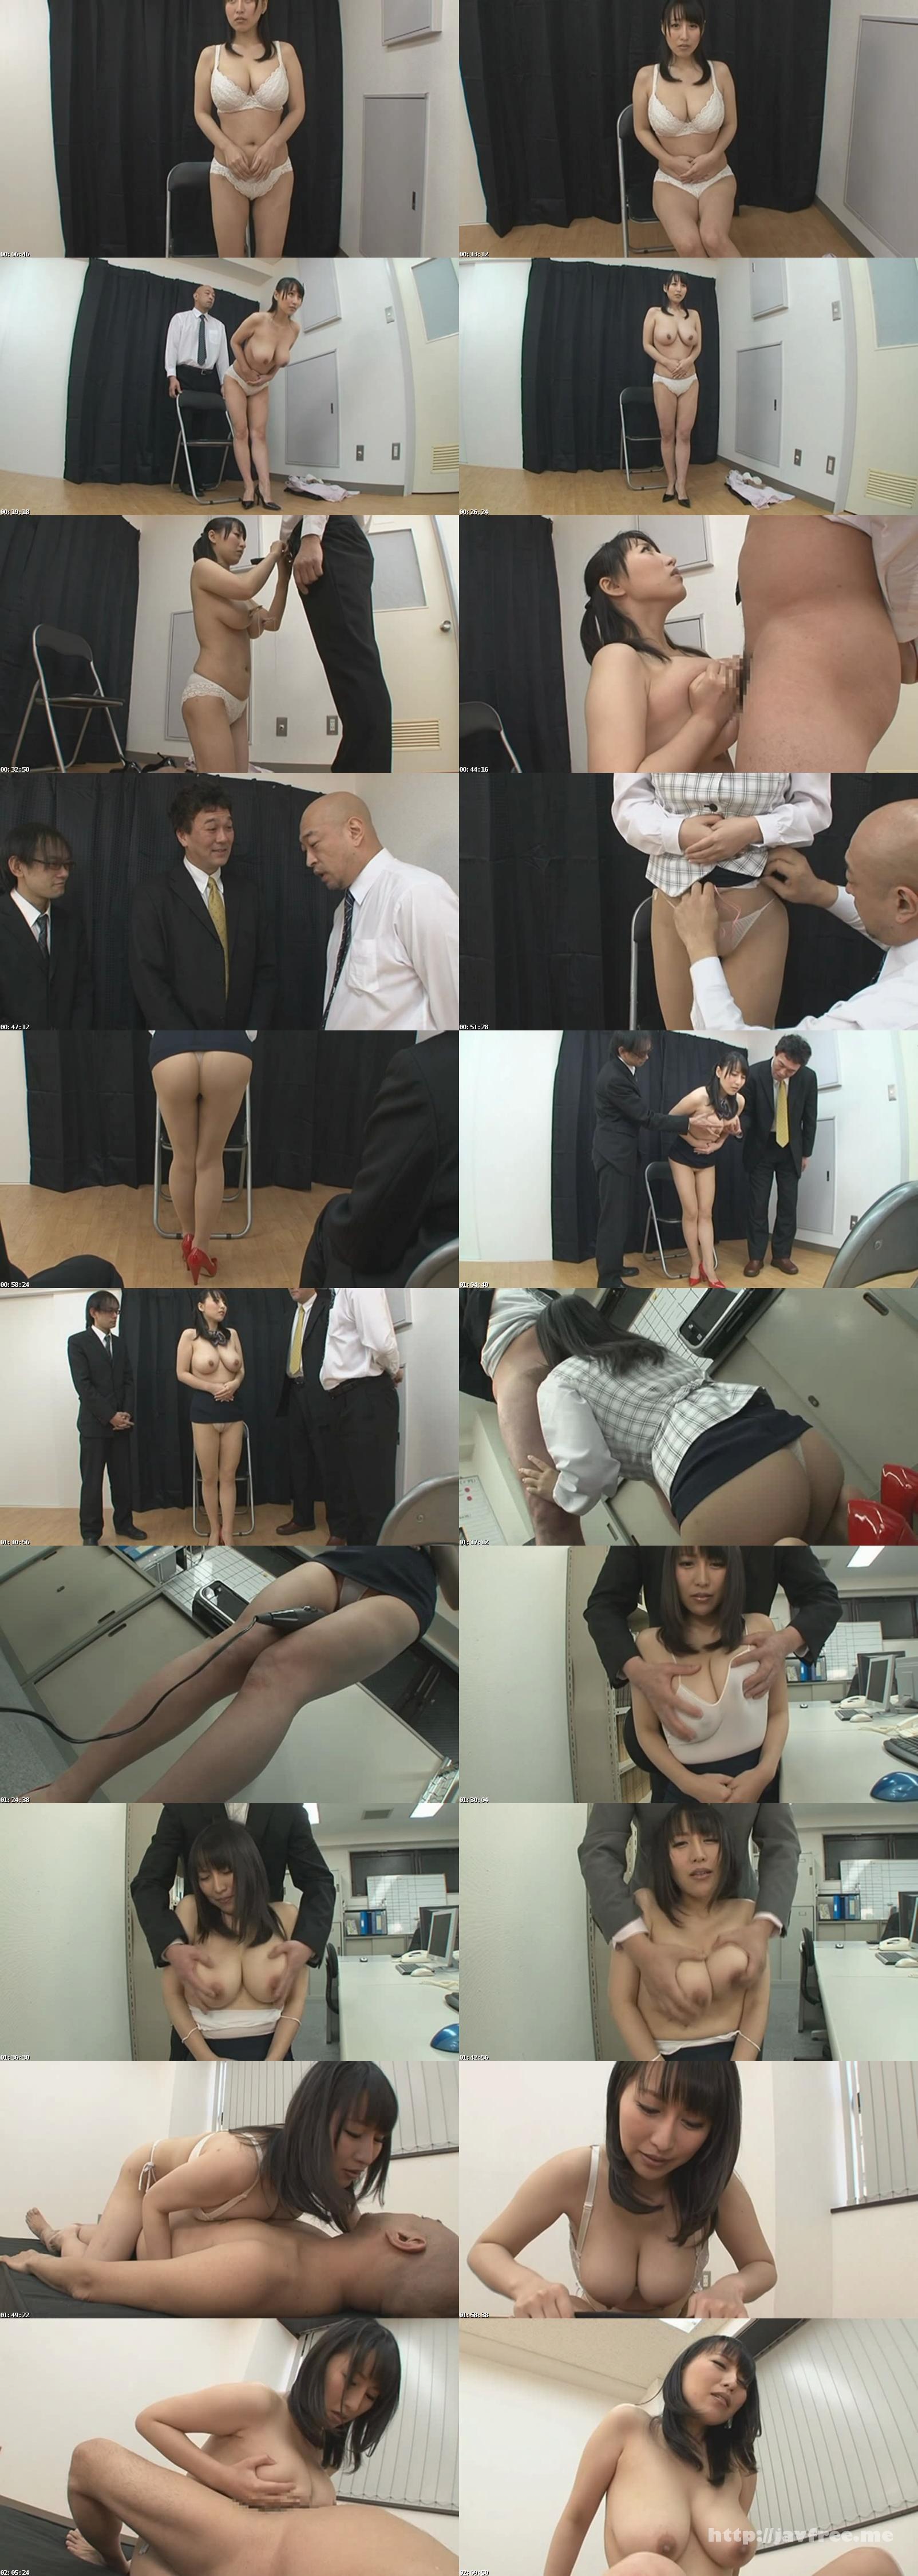 [NKD-132] 巨乳女子社員再教育プログラム2 星咲優菜